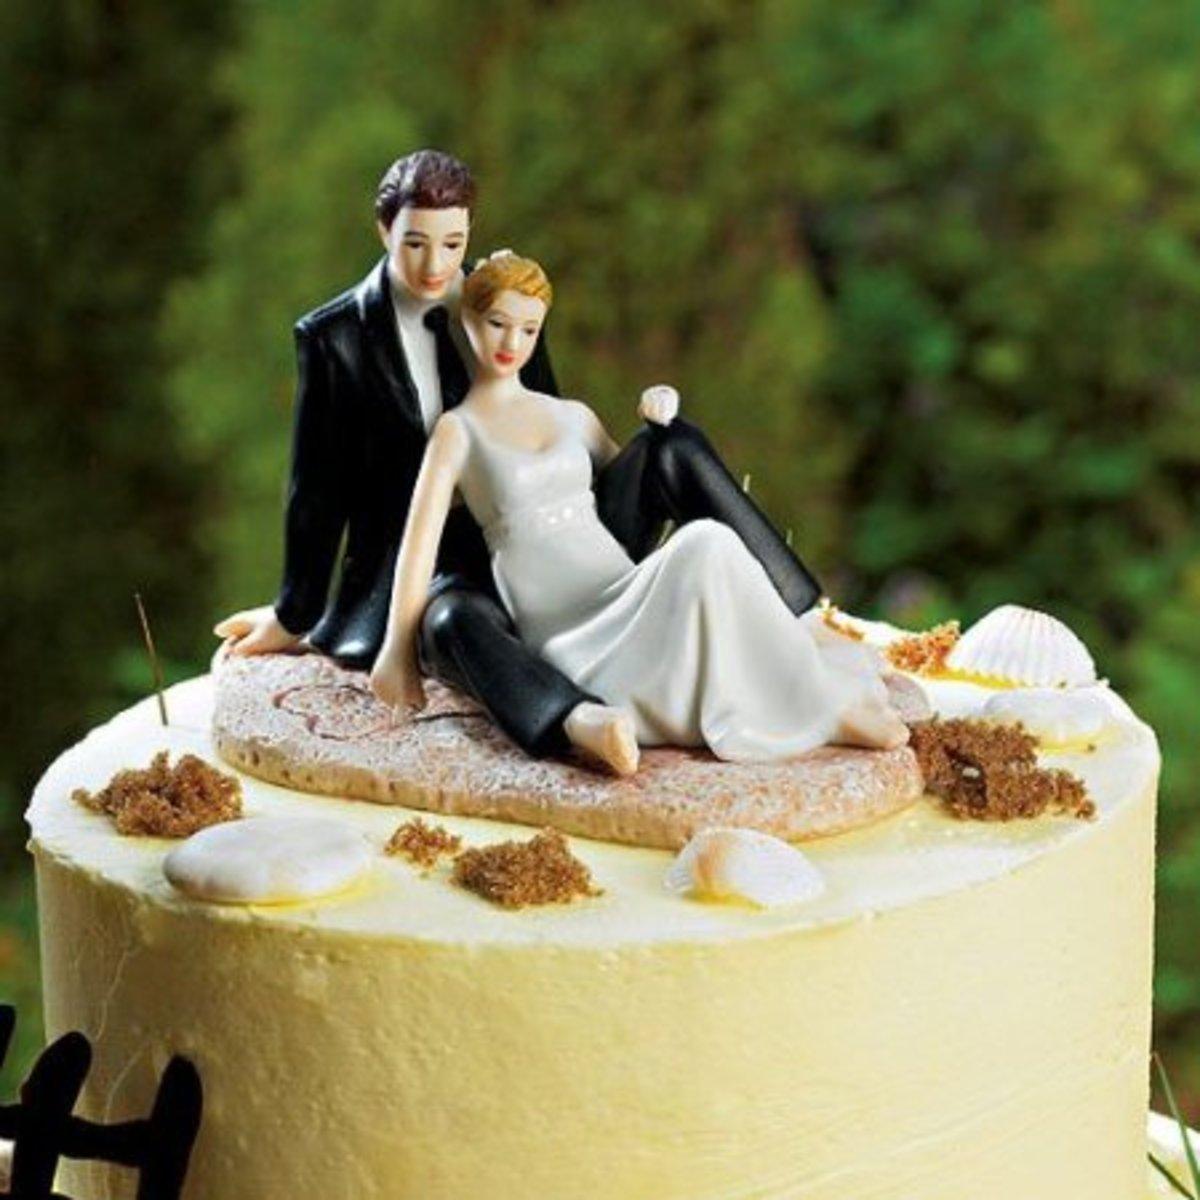 Lounging Couple - Beach Wedding Cake Topper